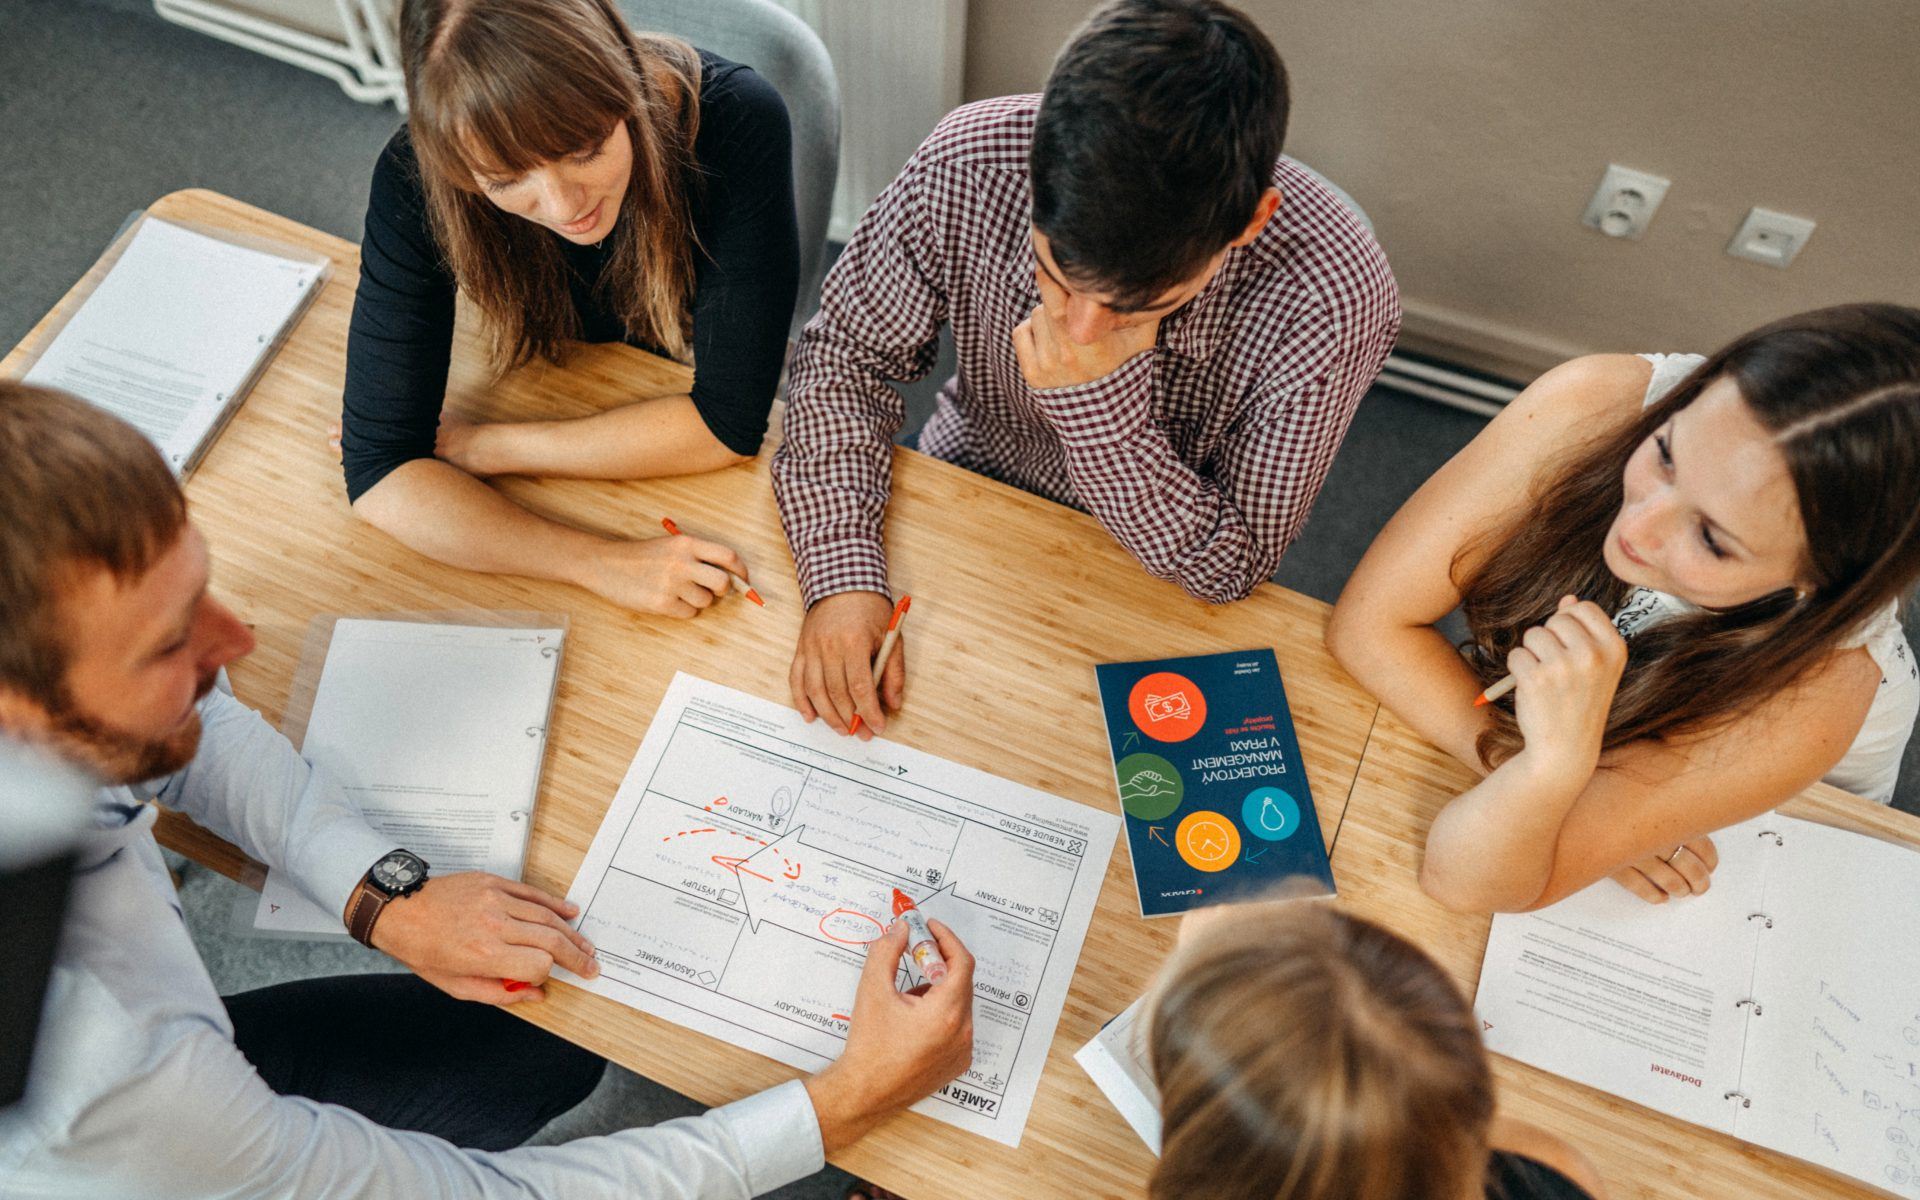 PMI-PMP certification preparatory course